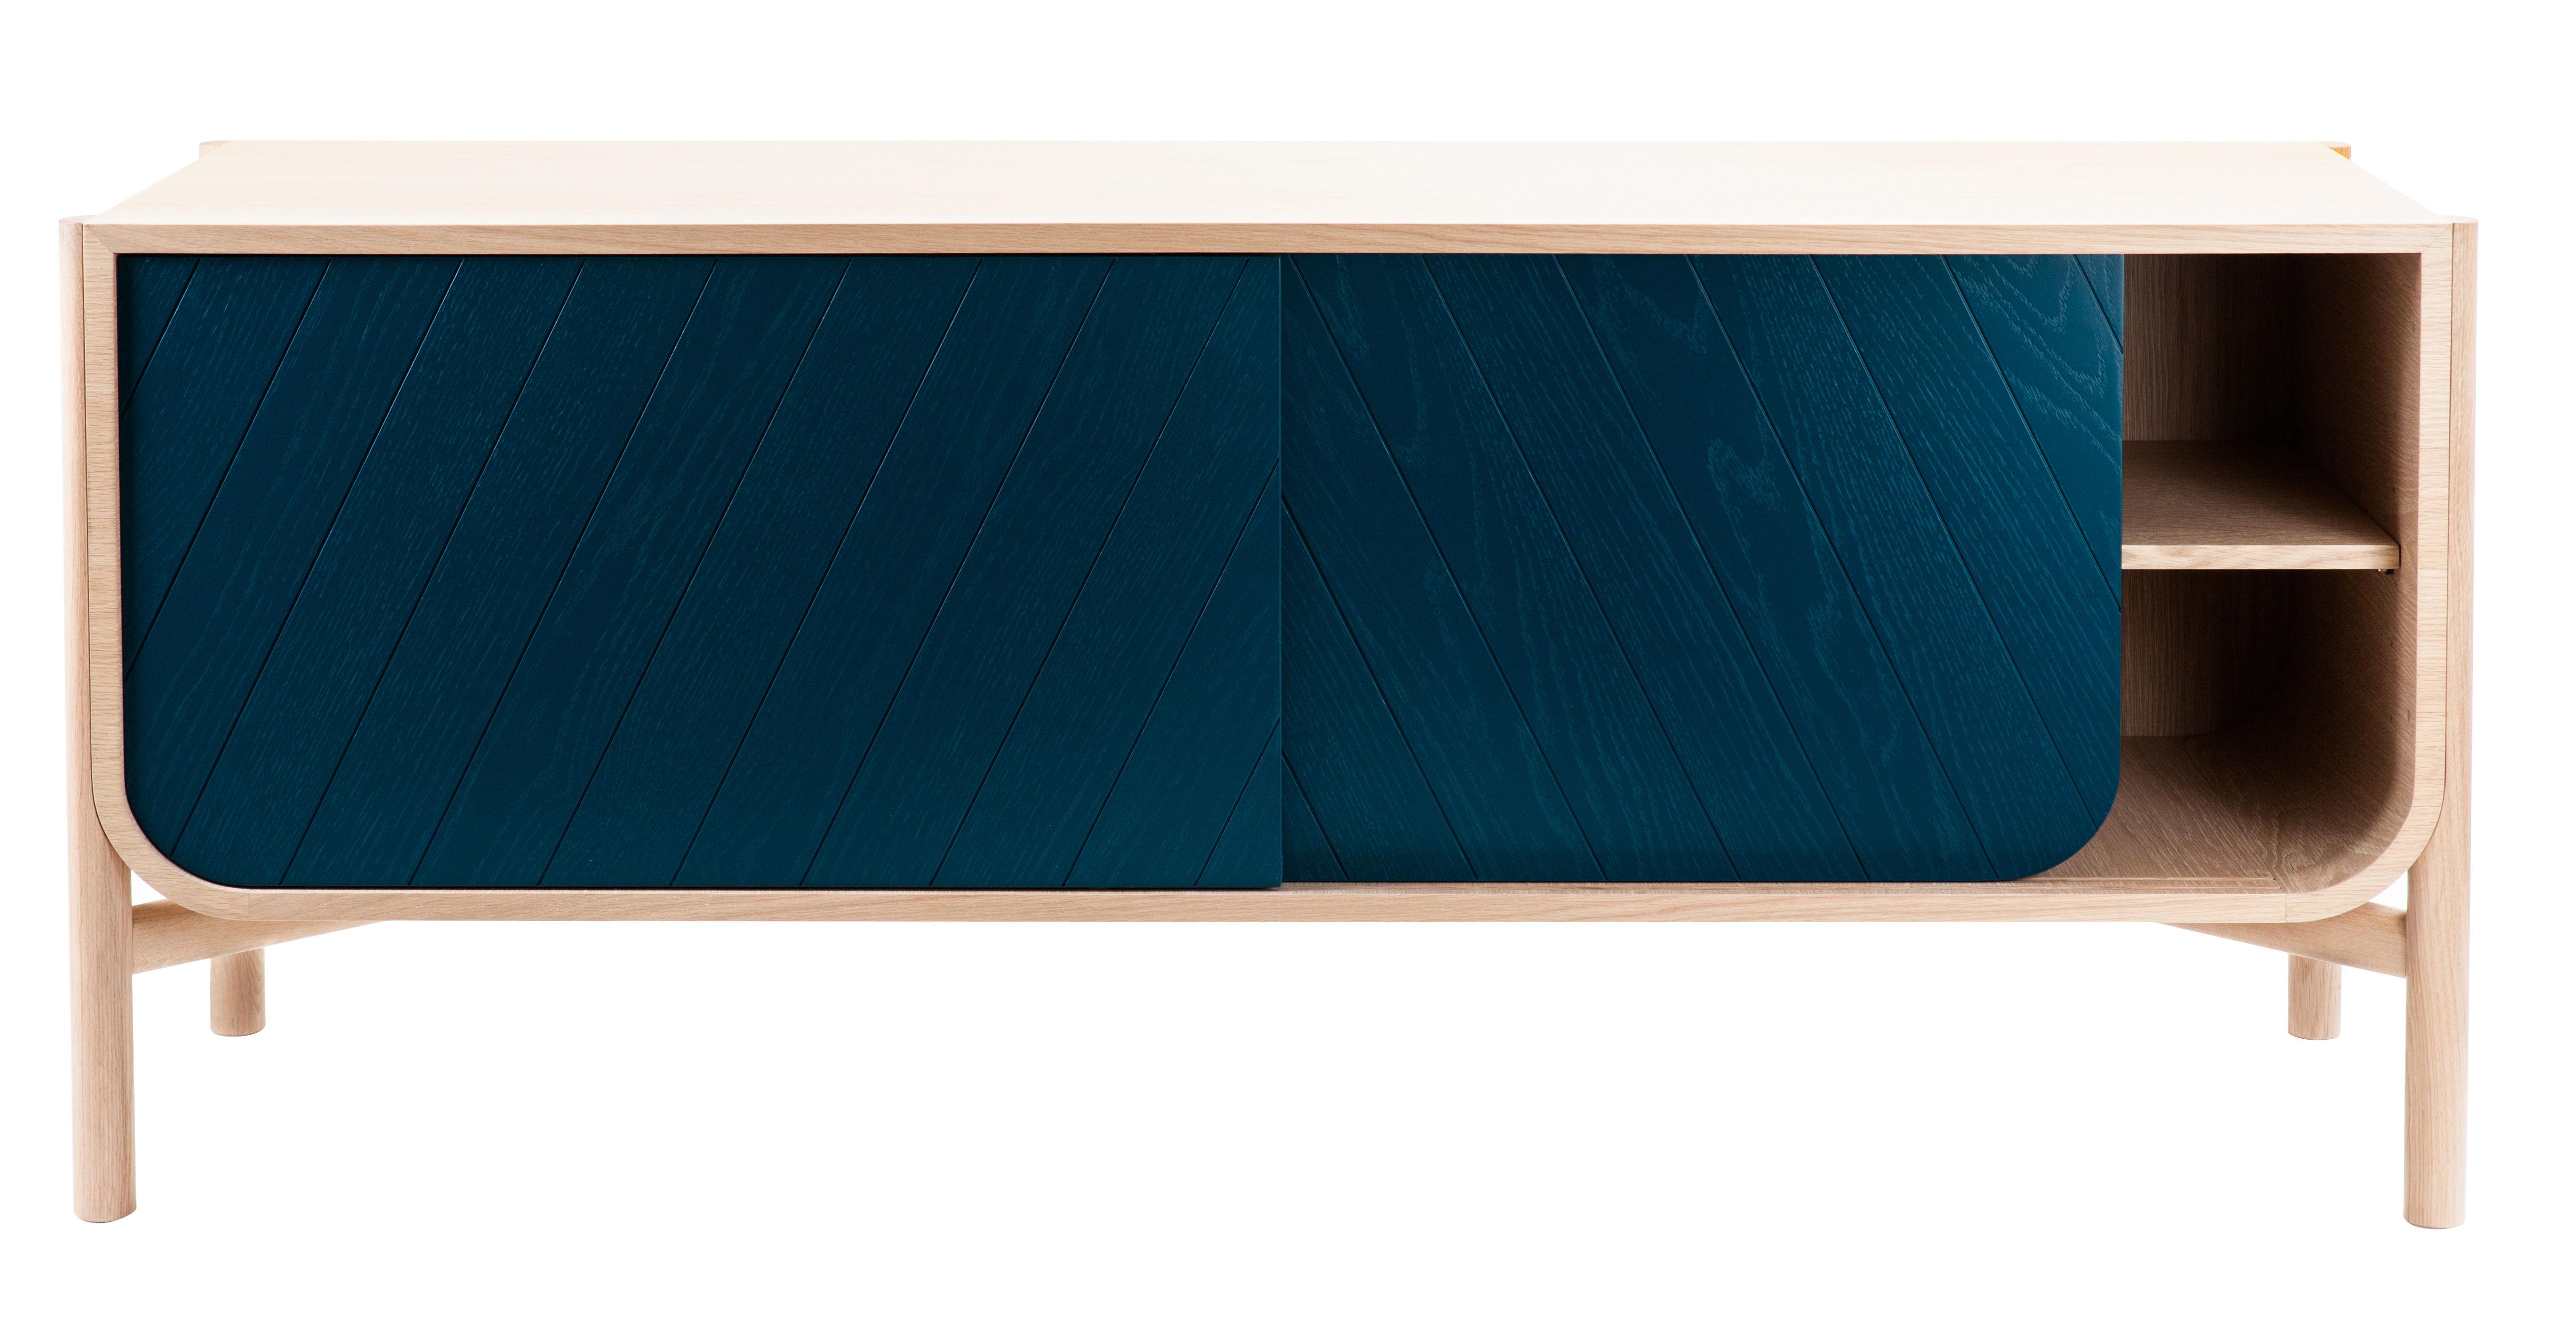 buffet marius meuble tv l 185 x h 65 cm bleu p trole ch ne naturel hart. Black Bedroom Furniture Sets. Home Design Ideas